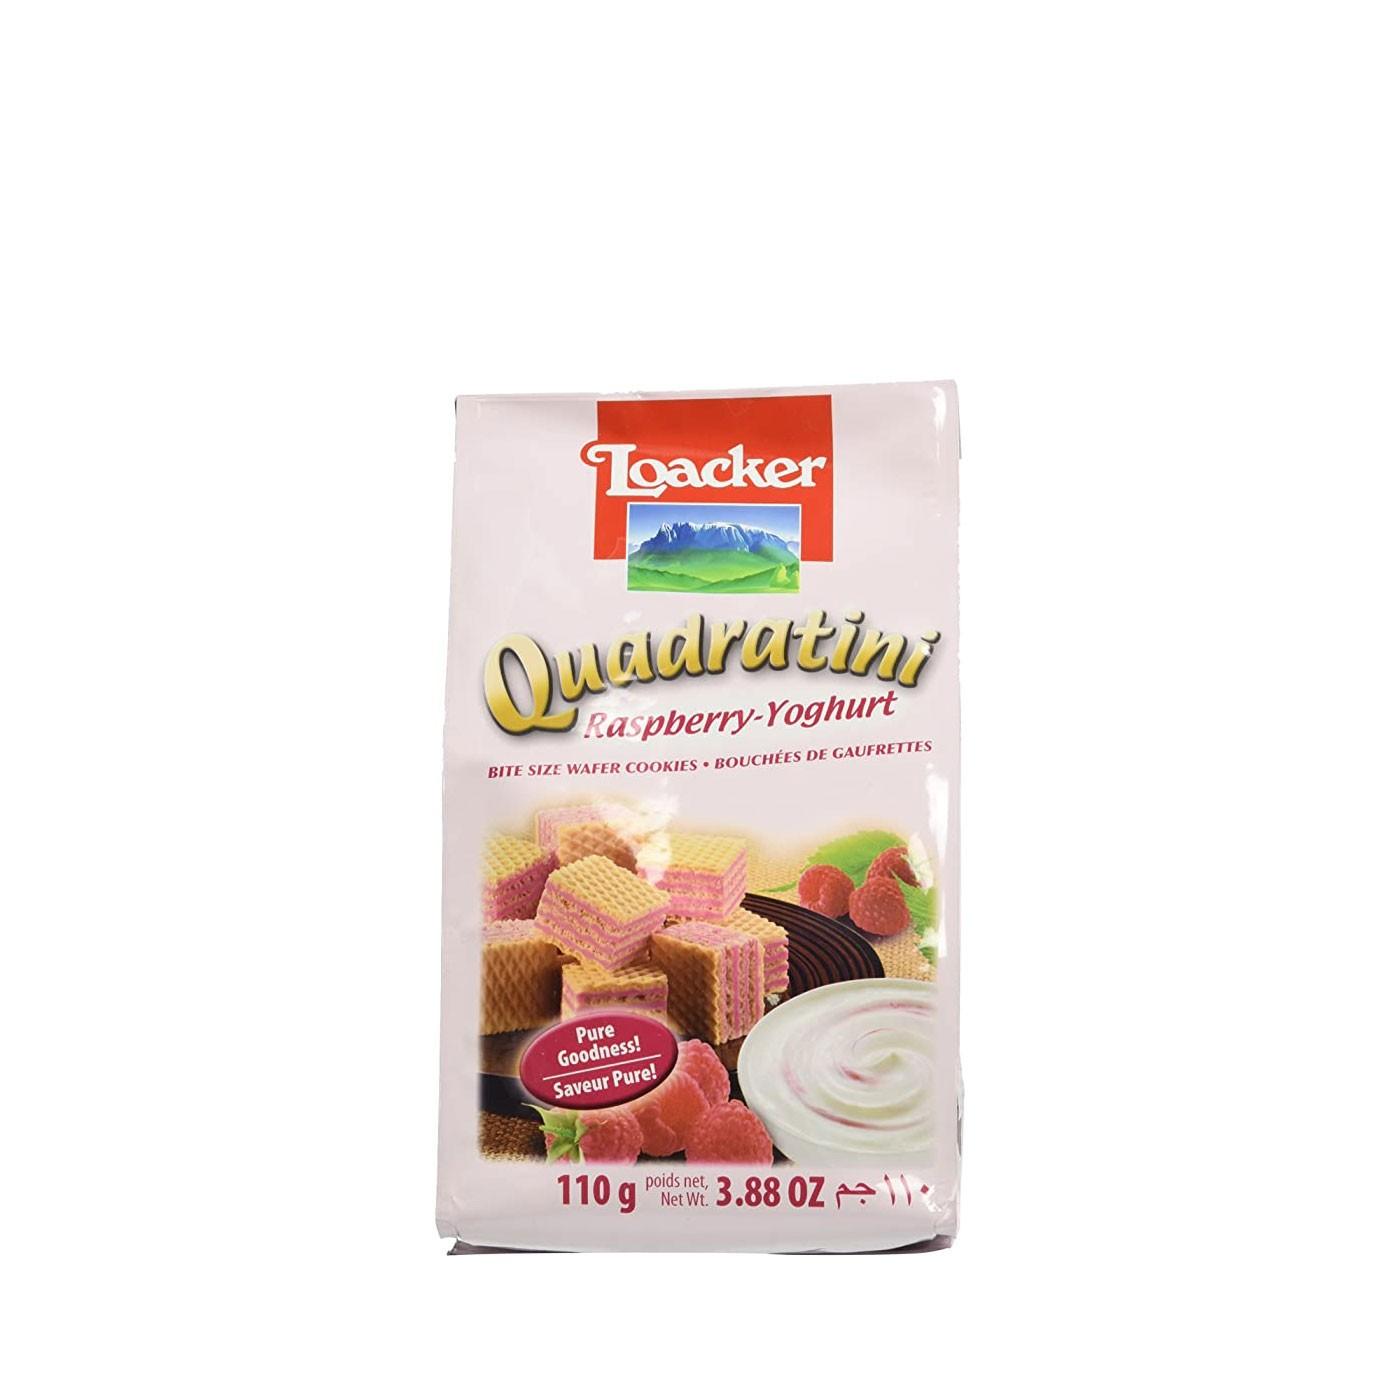 Raspberry and Yogurt Quadratini 7.7 oz